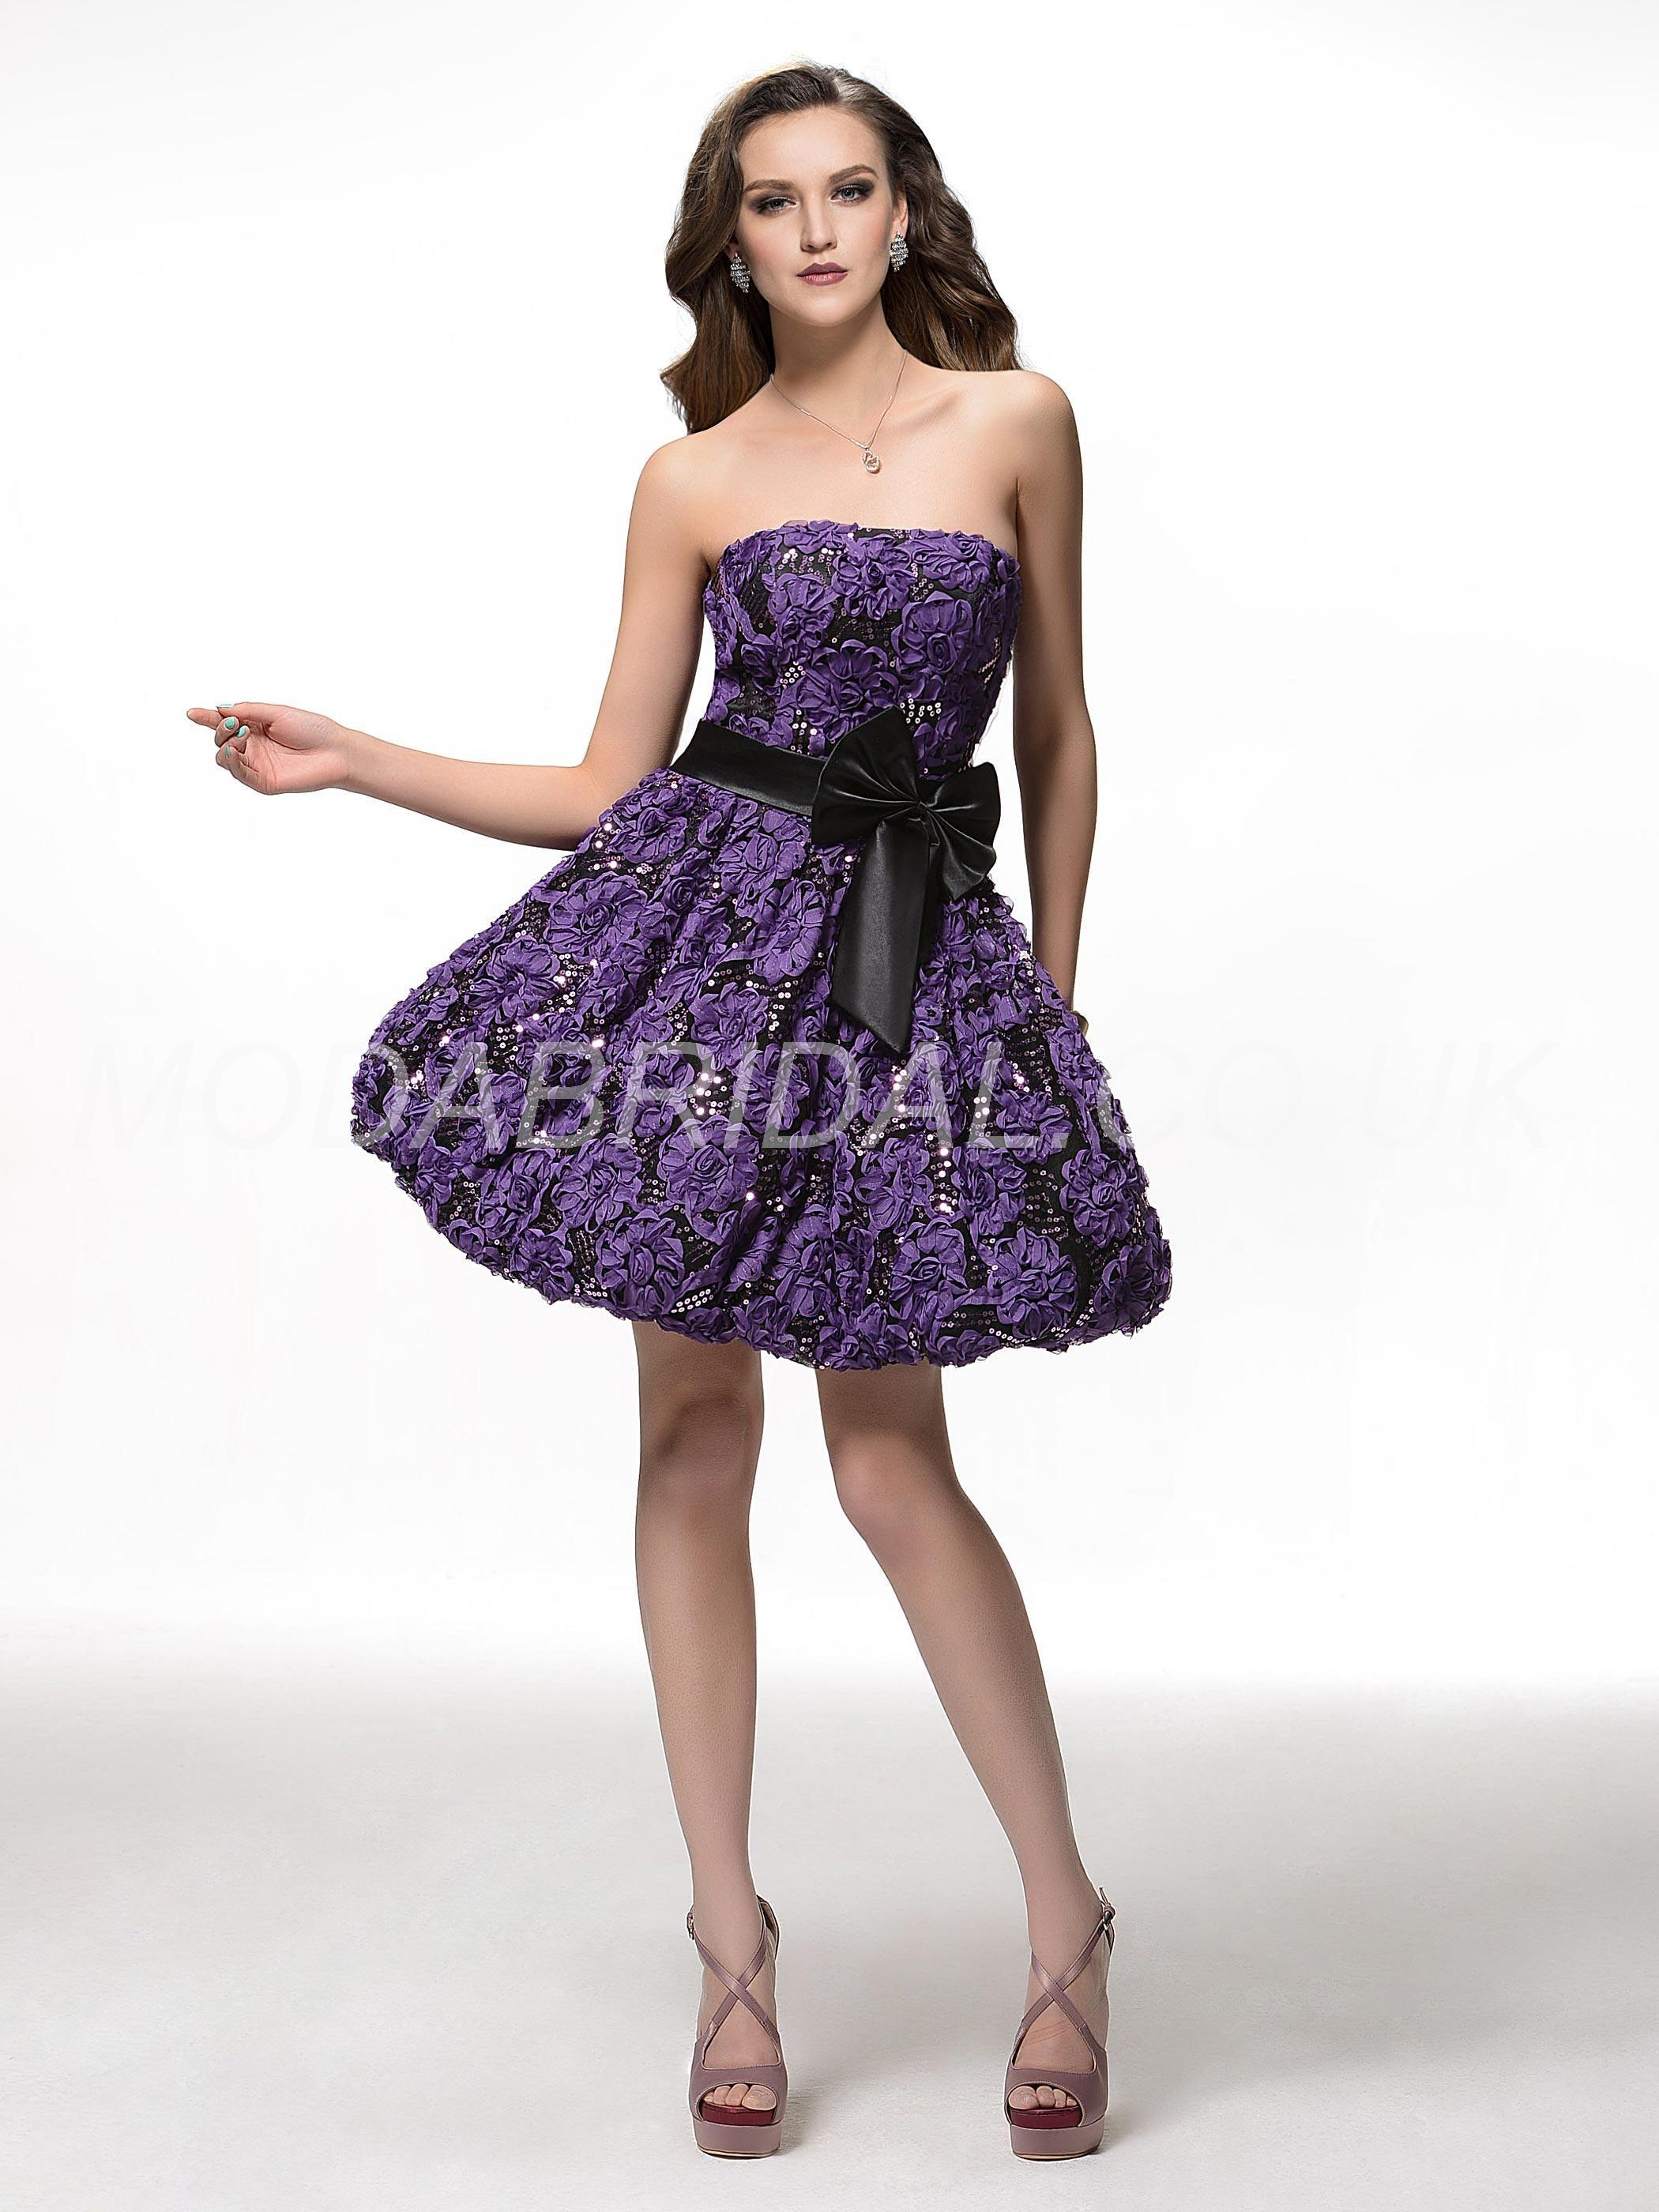 modabridal.co.uk SUPPLIES UK Style All Sizes Zipper-up Spring Purple ...